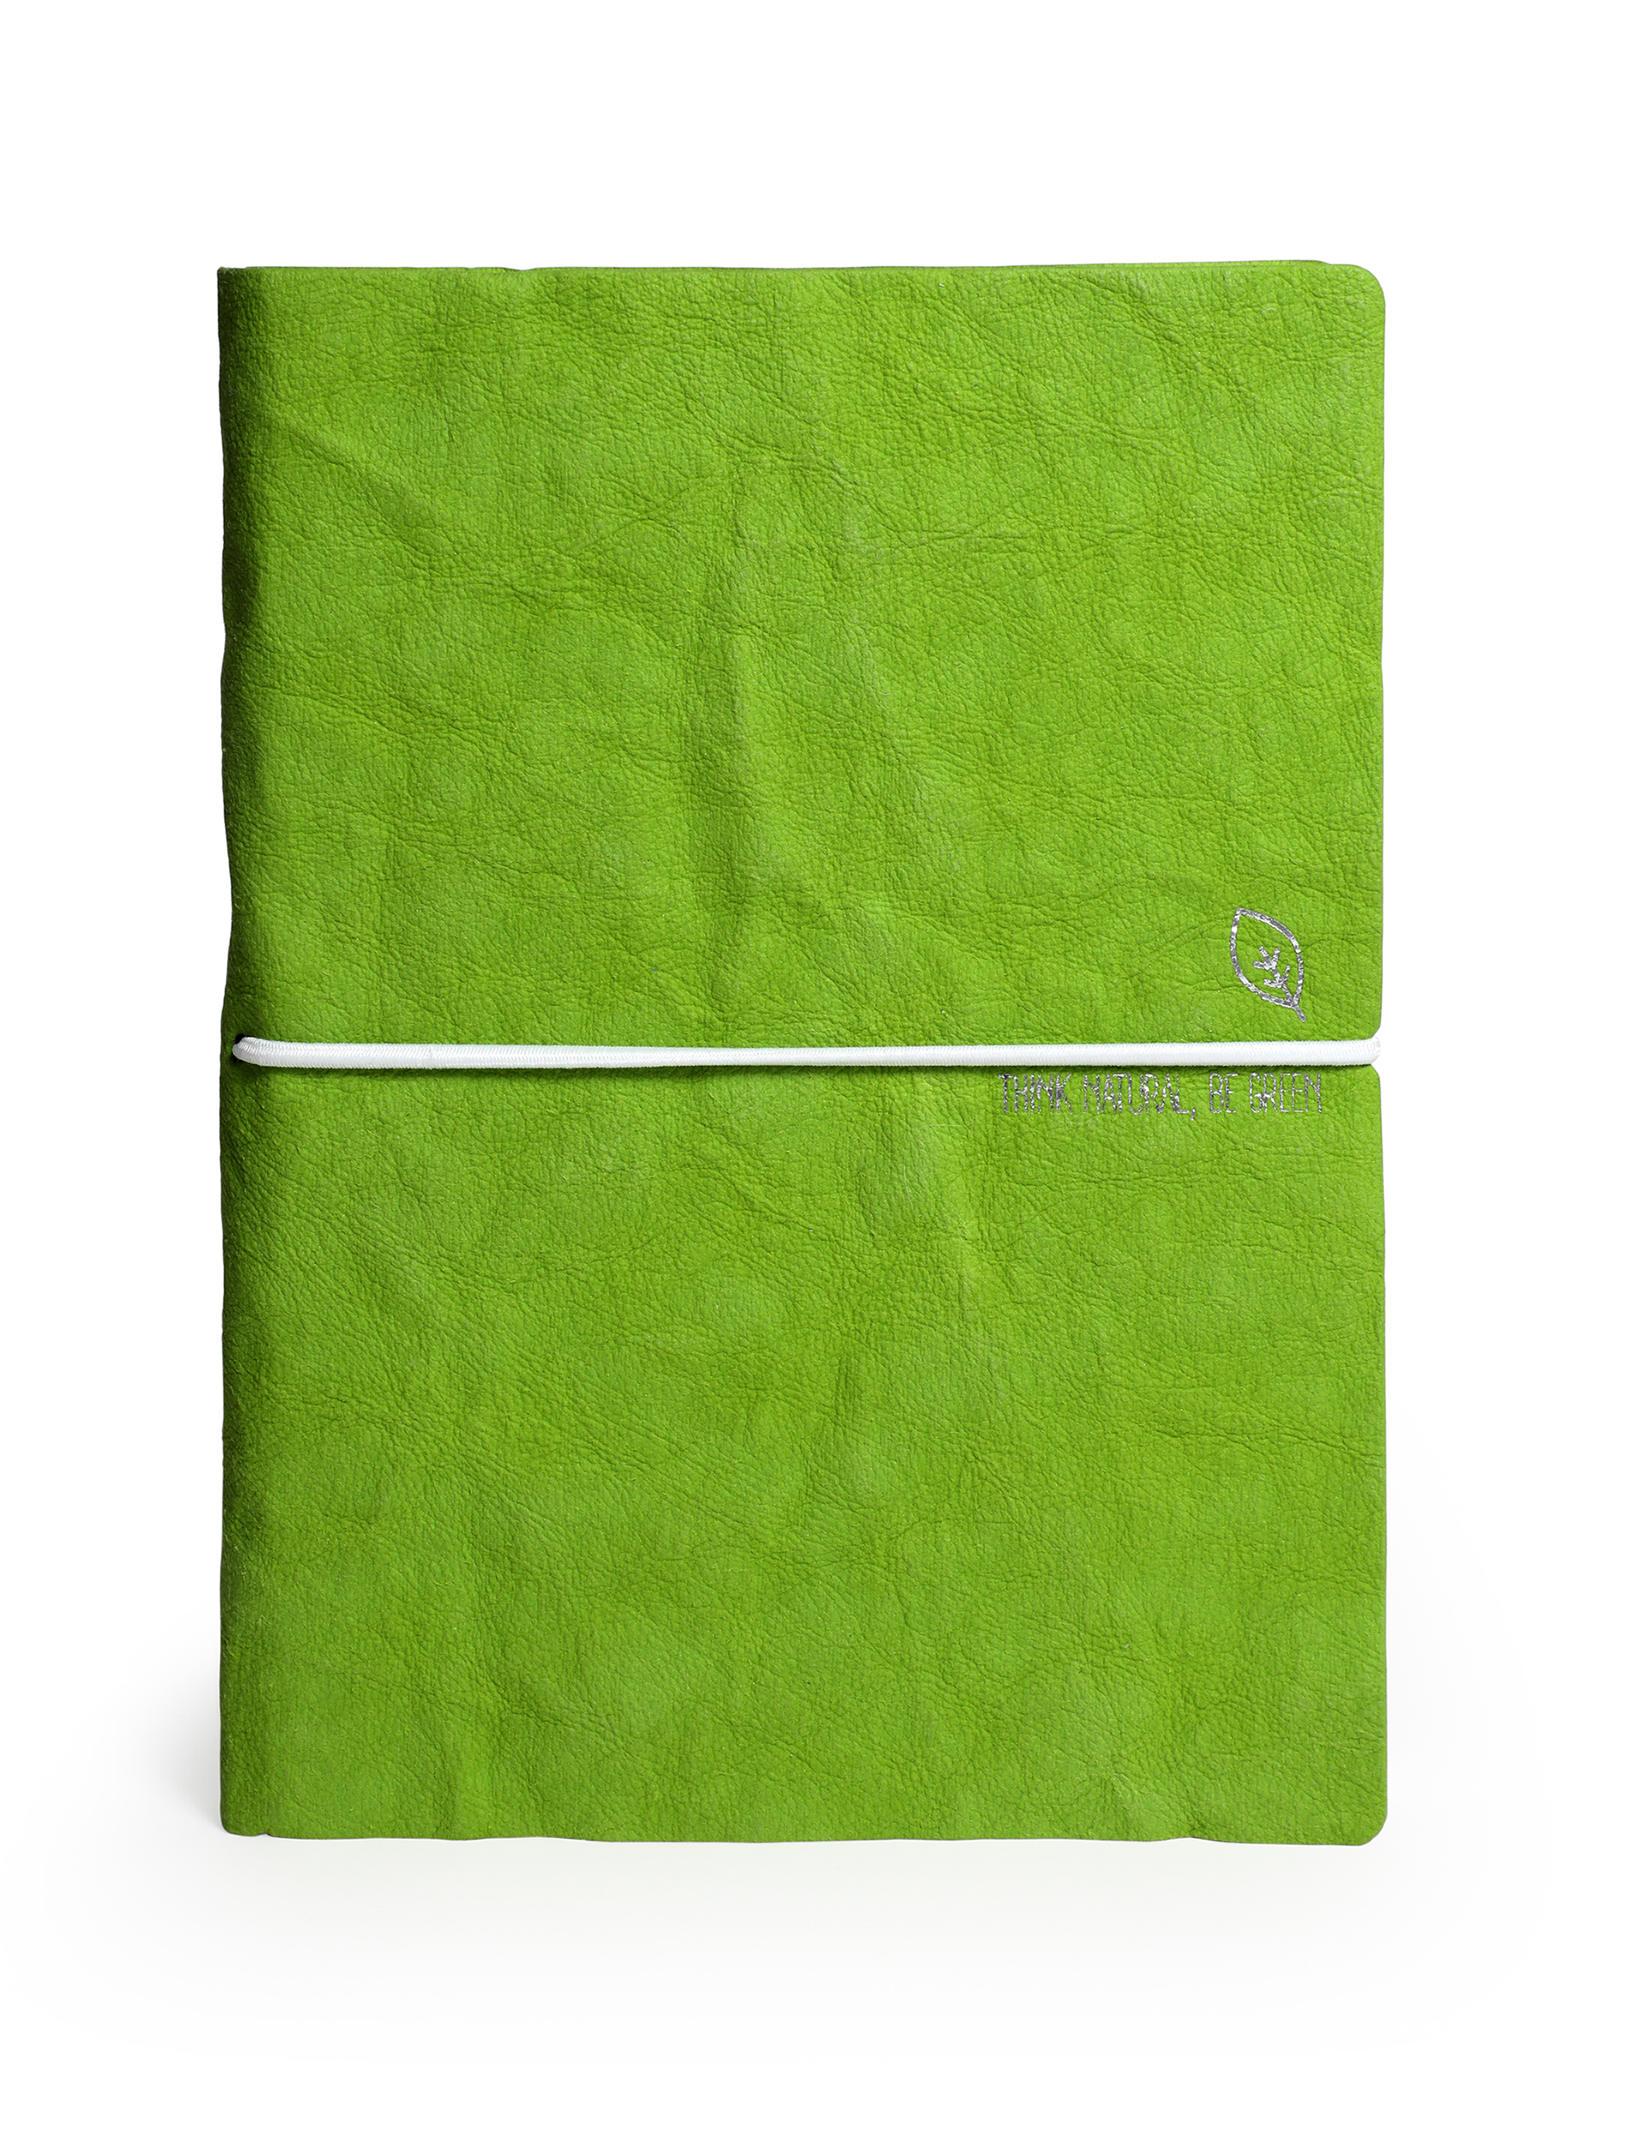 Ciak THINK NATURAL Notebook